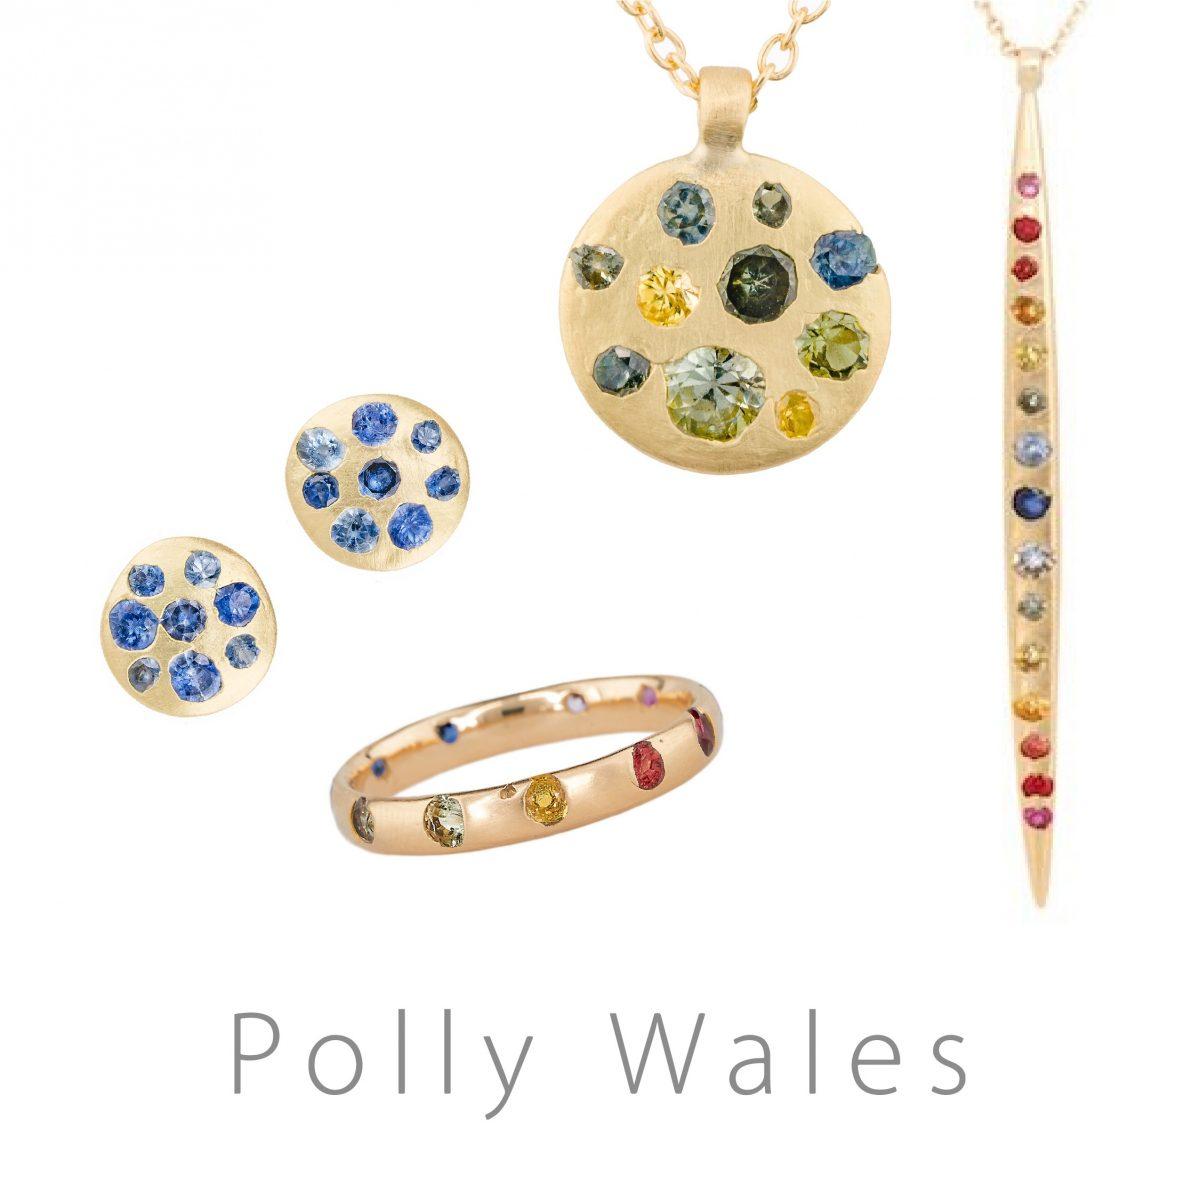 POLLY WALES ポリーウェールズ アッシュペー アッシュペーフランスビジュー HPFRANCEBIJOUX 天然石